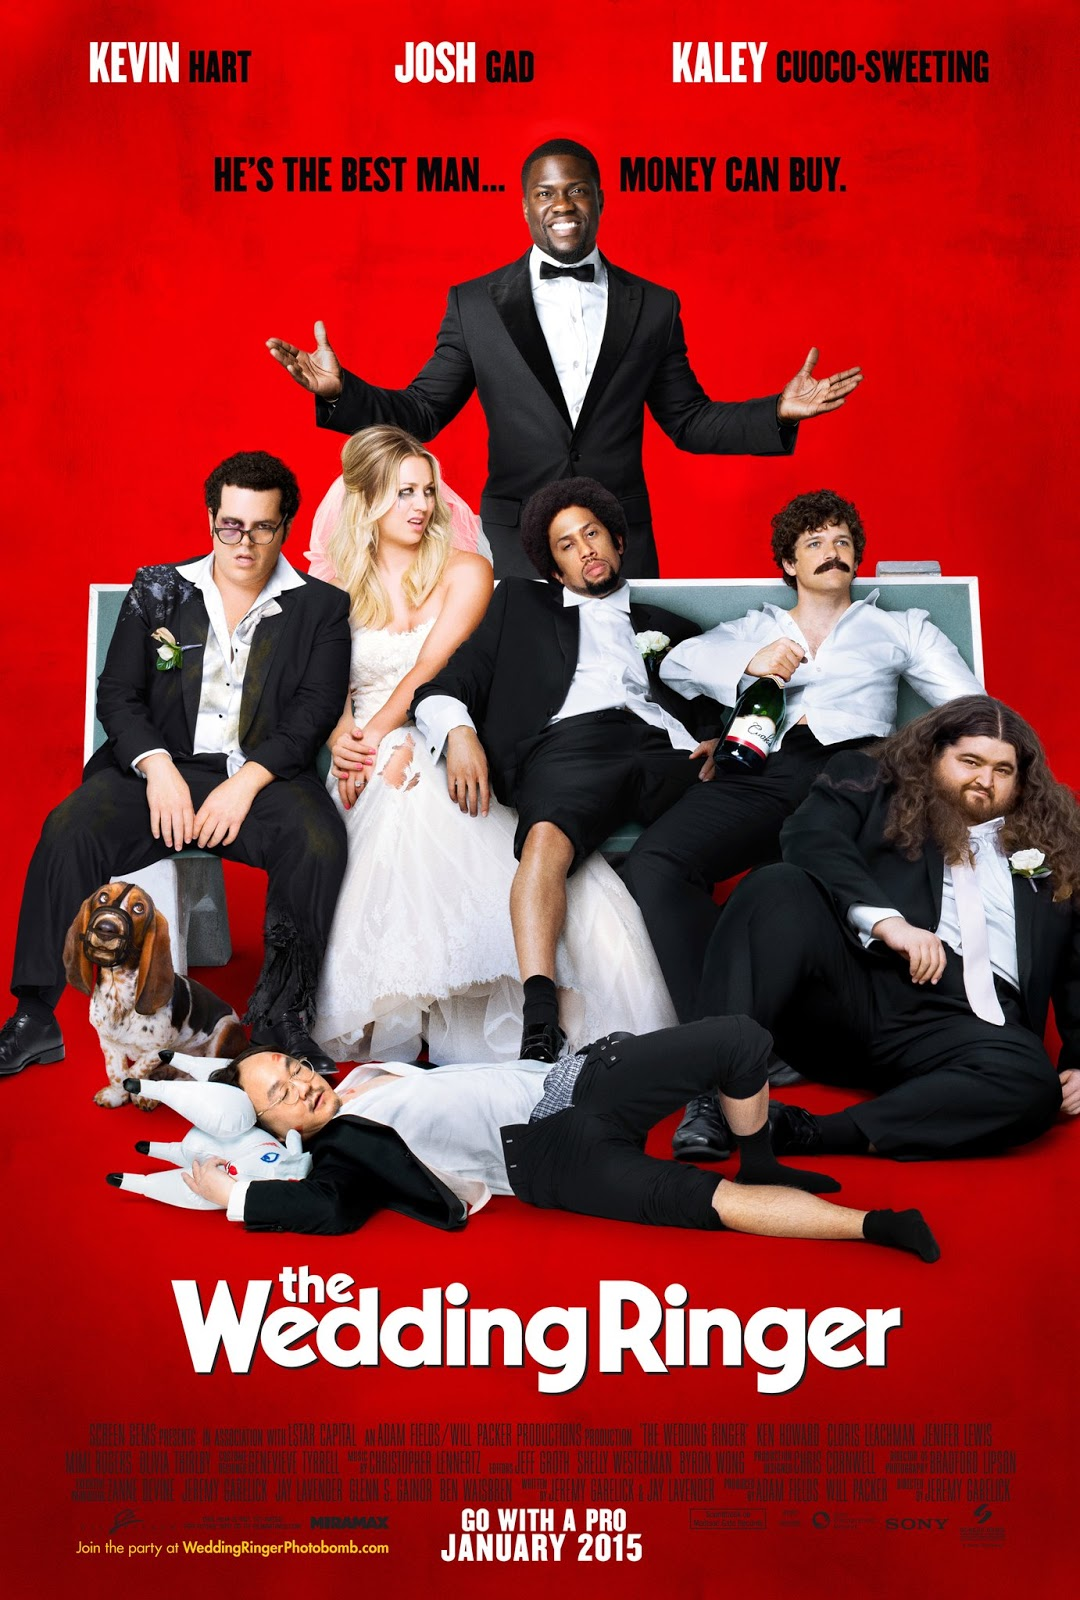 The Wedding Ringer (2015) วิวาห์ป่วน ก๊วนเพื่อนเก๊ [HD][พากย์ไทย]